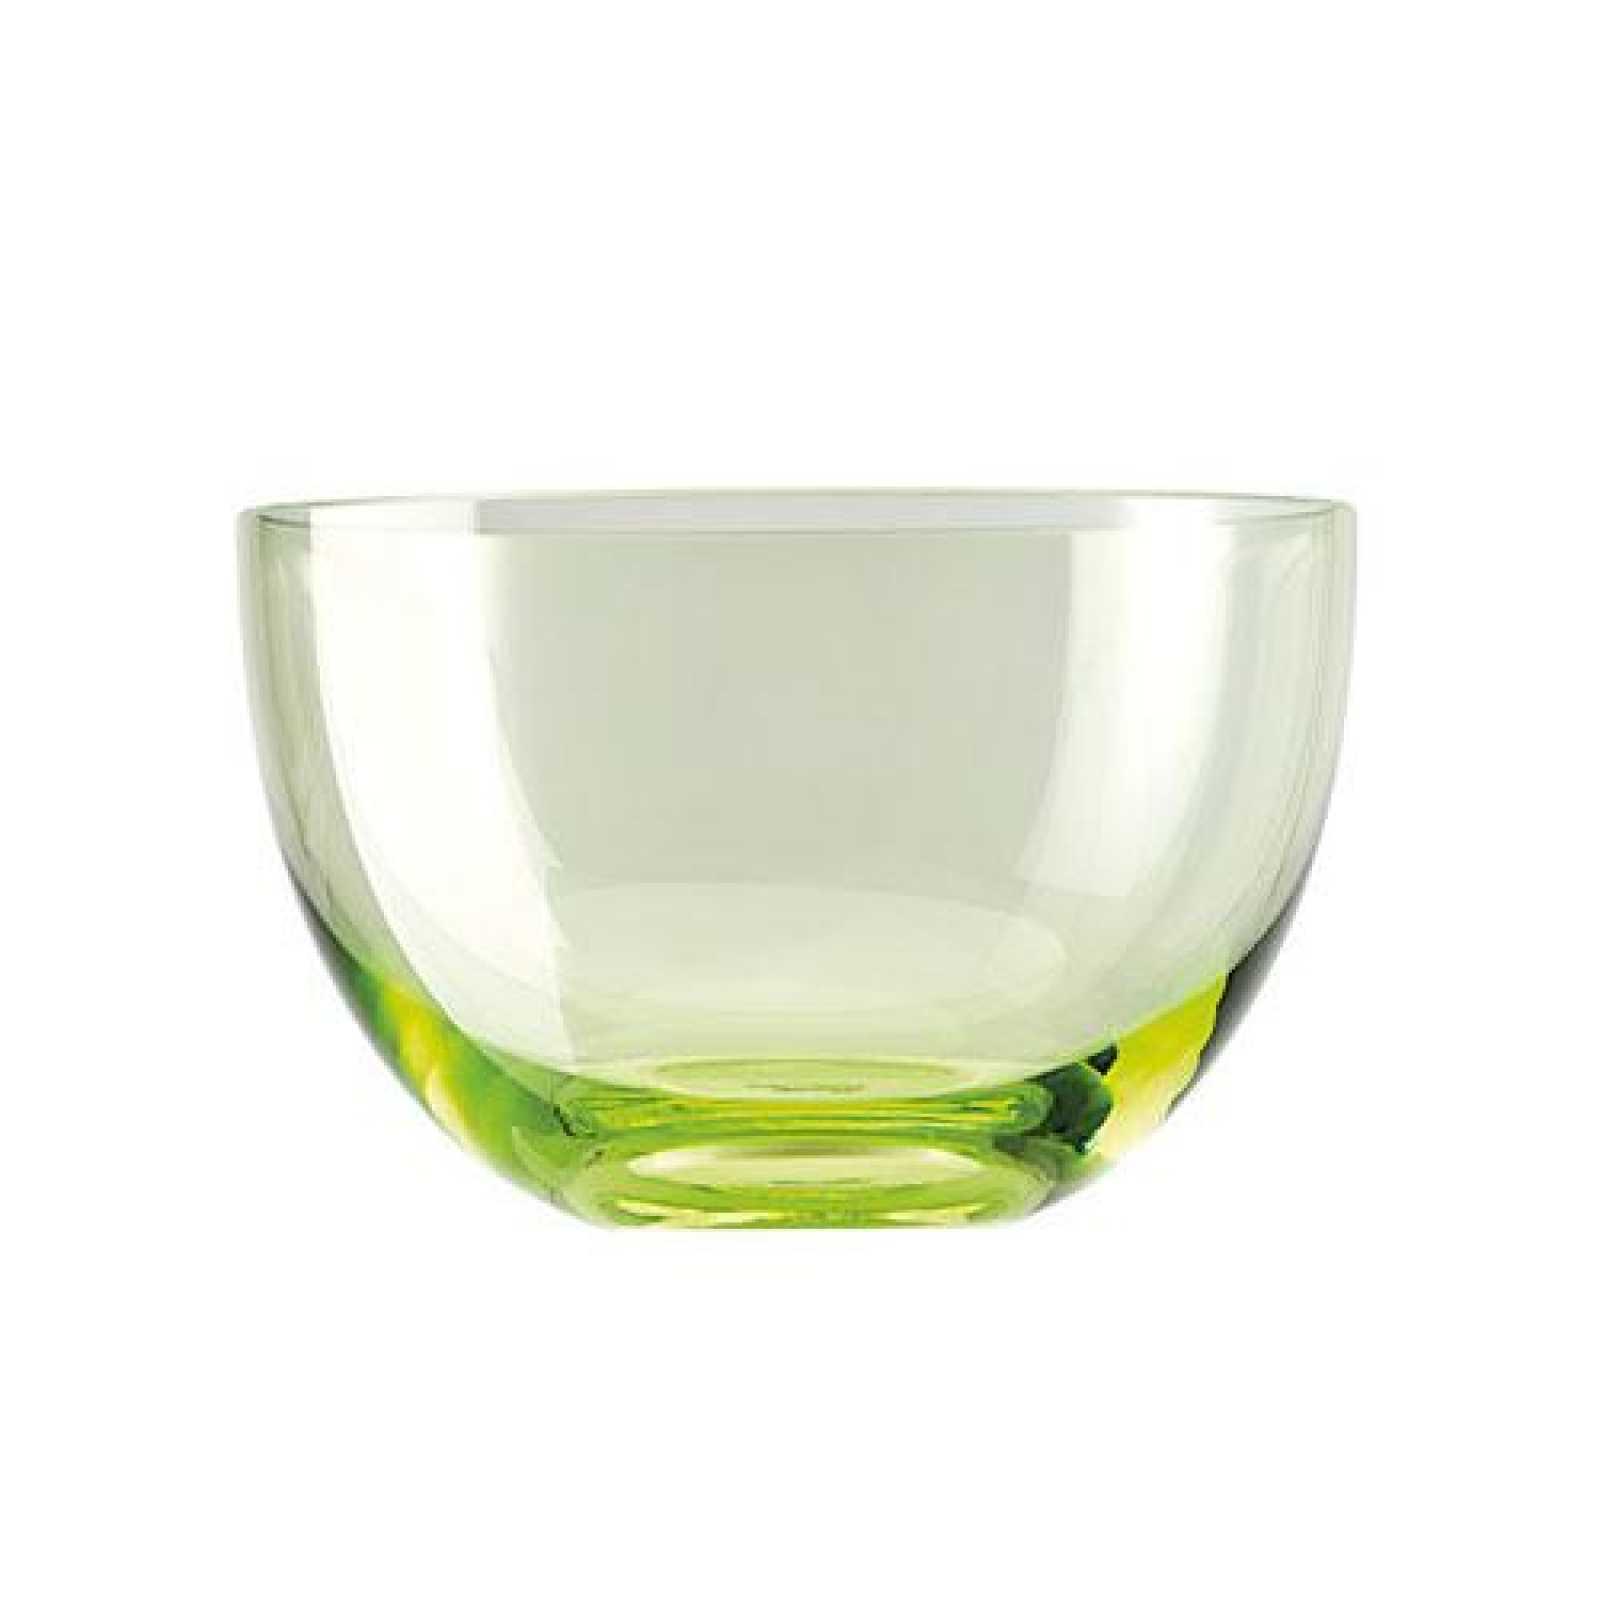 Онлайн каталог PROMENU: Пиала стеклянная Rosenthal SUNNY DAY, диаметр 12 см, прозрачный зеленый Rosenthal 69034-408527-45312